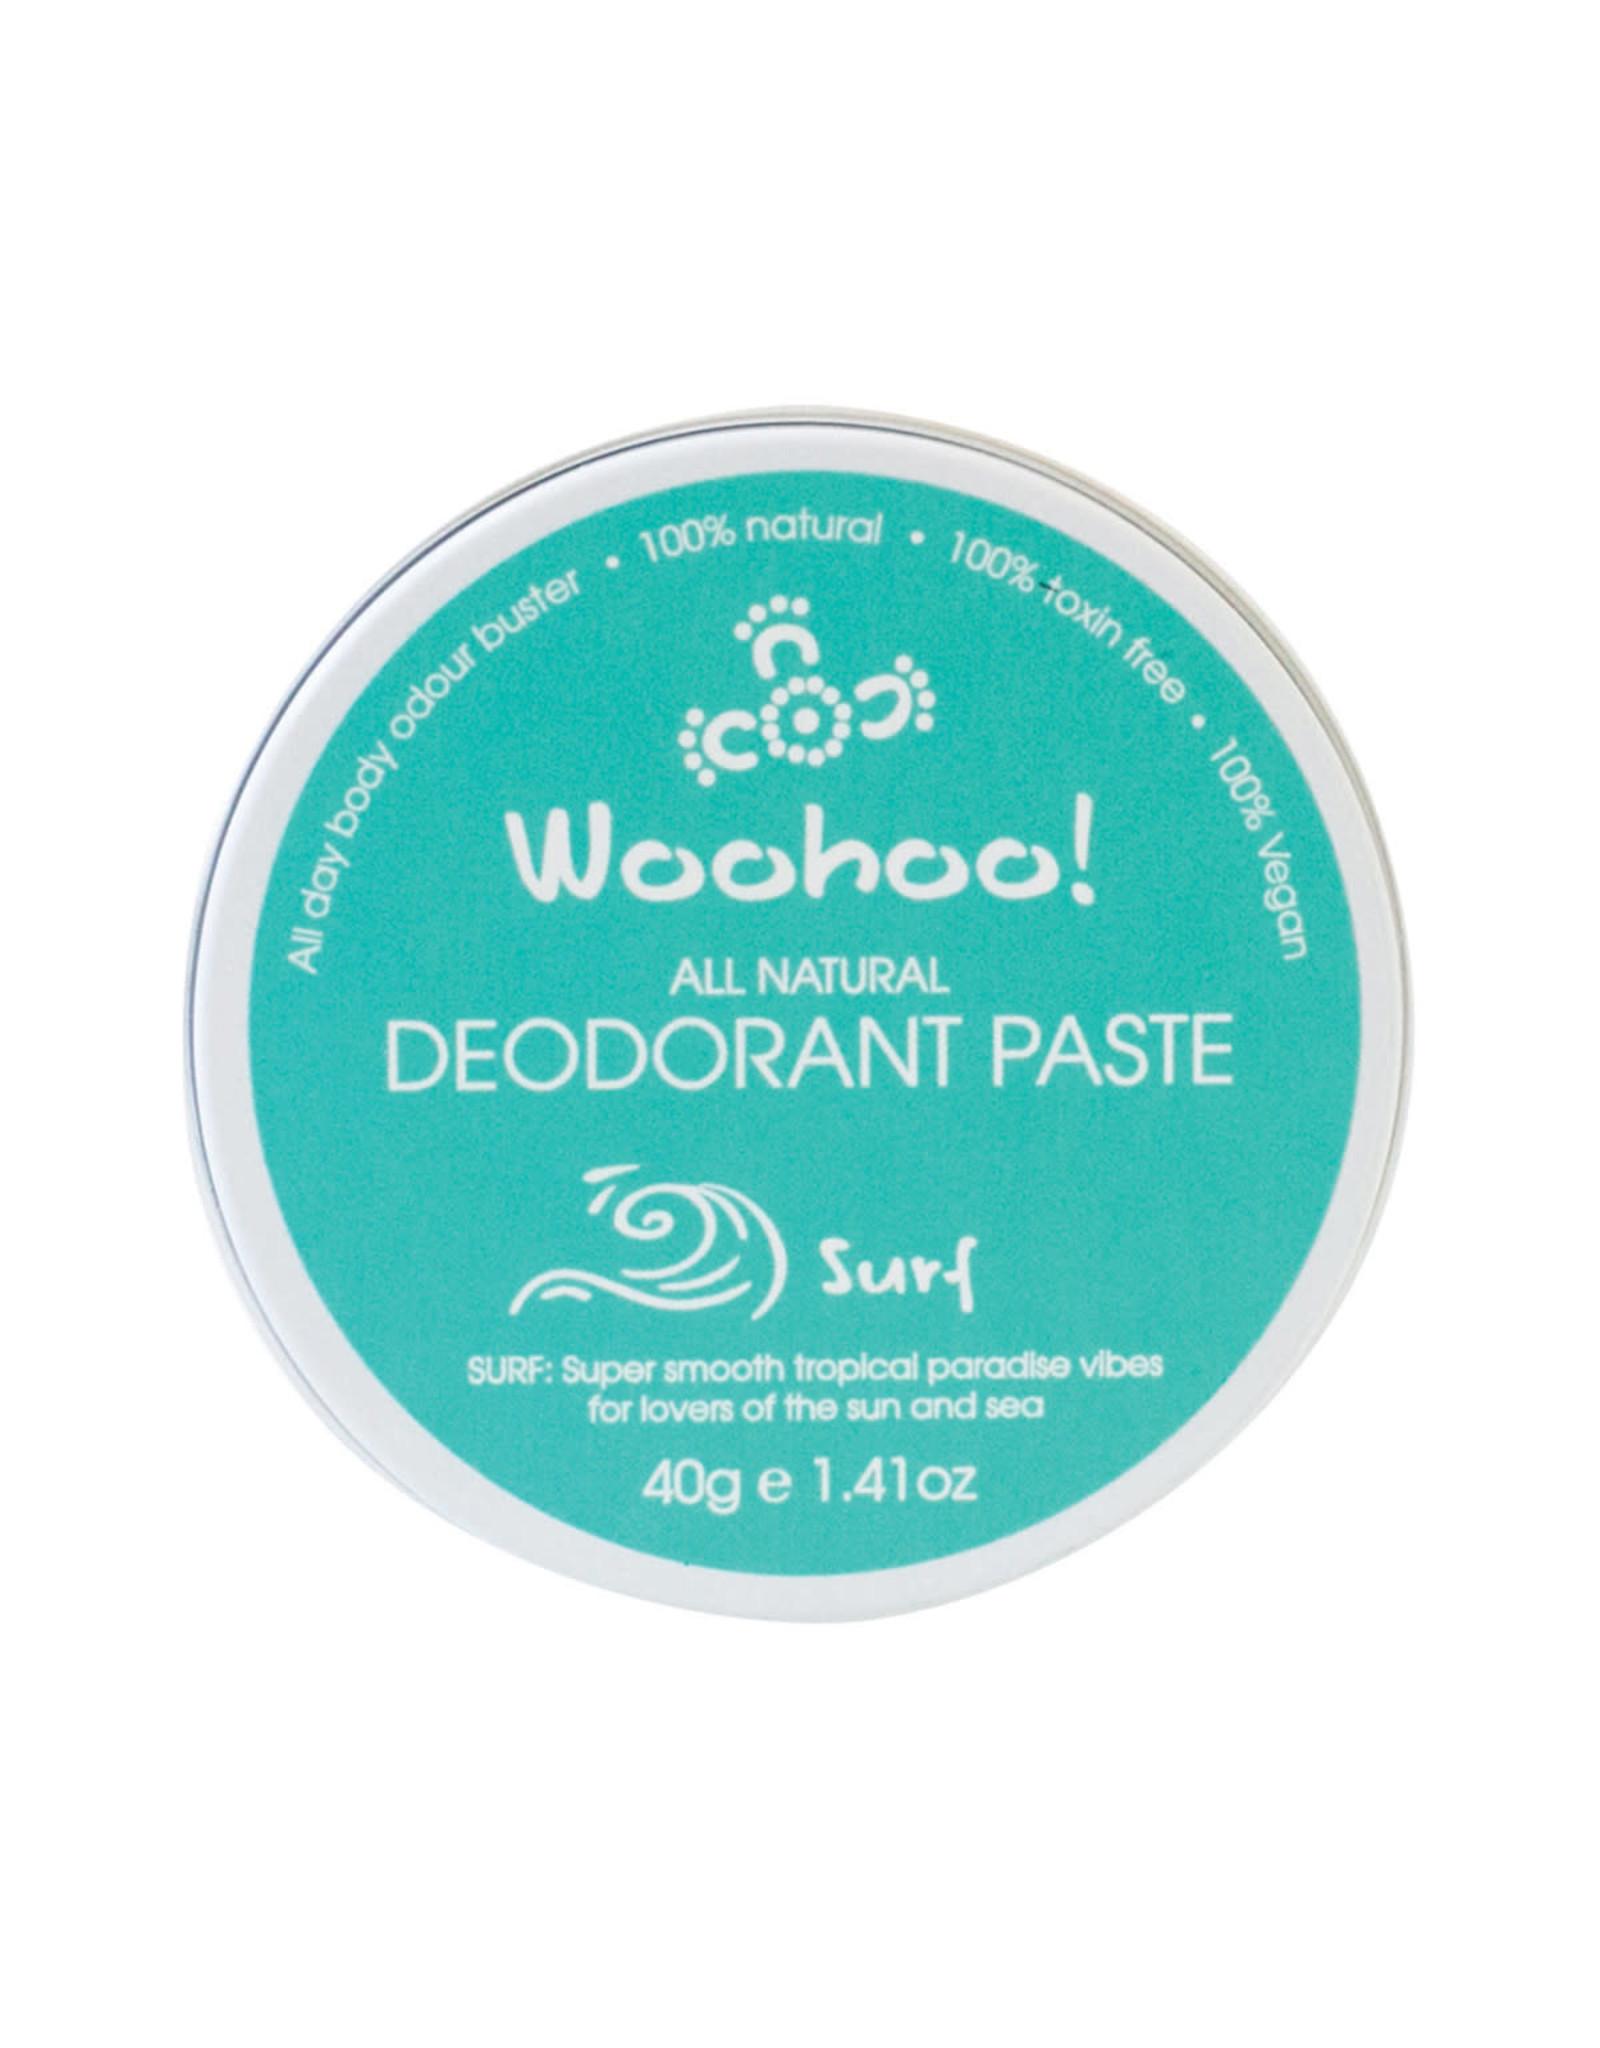 Happy Skincare Woohoo Deodorant Paste Surf 40g